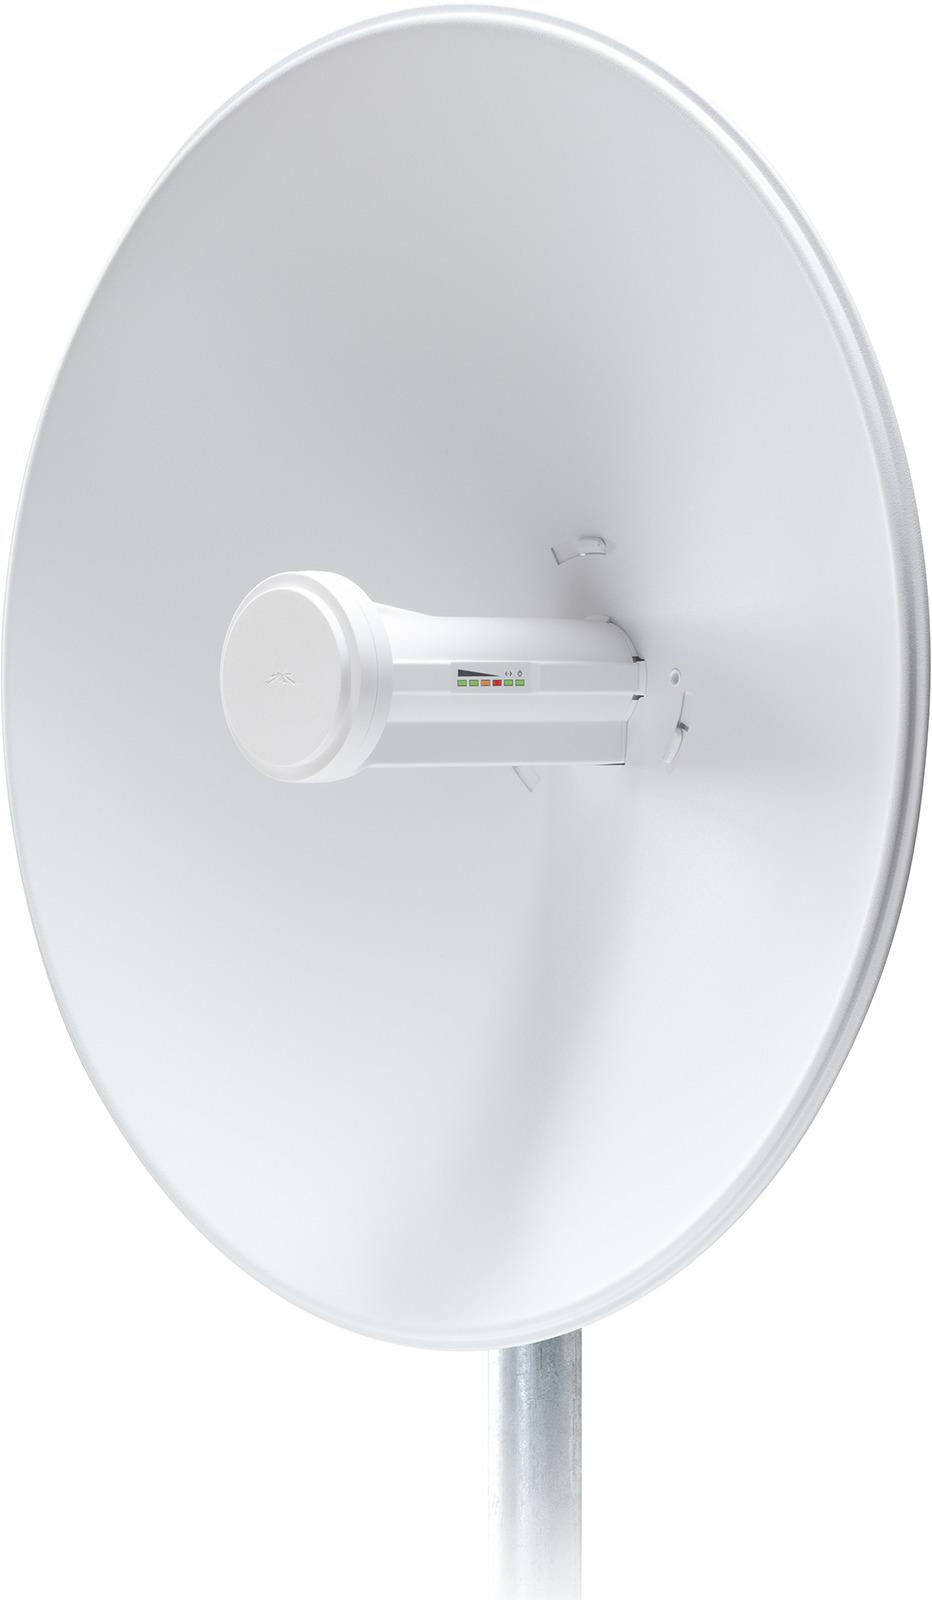 Точка доступа Ubiquiti, PBE-M5-400, белый